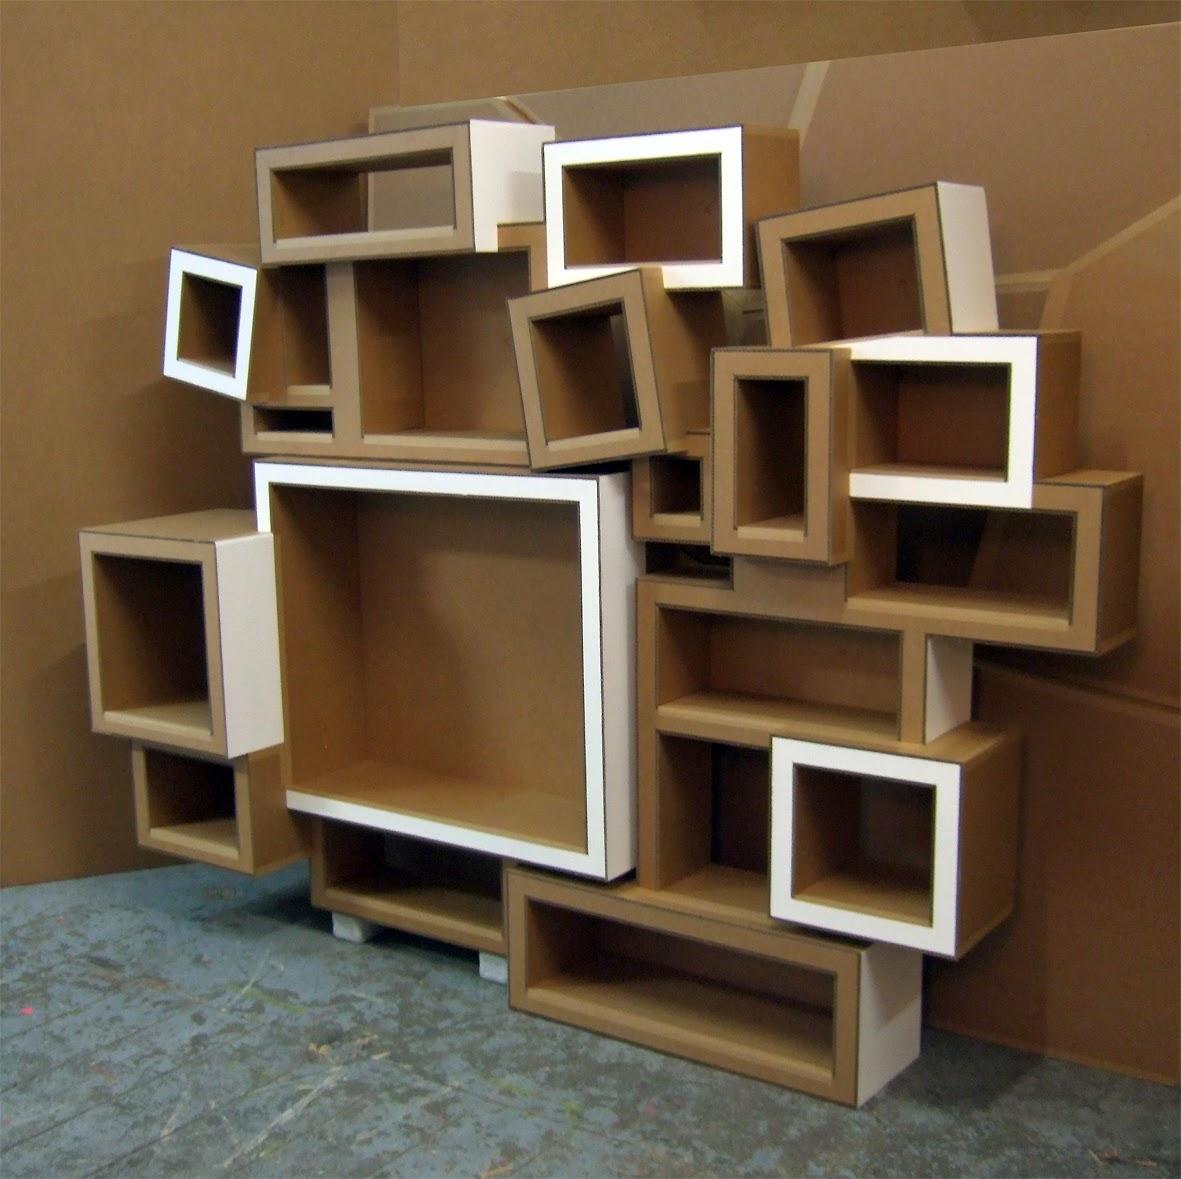 Juliadesign for Meuble pour ranger les livres